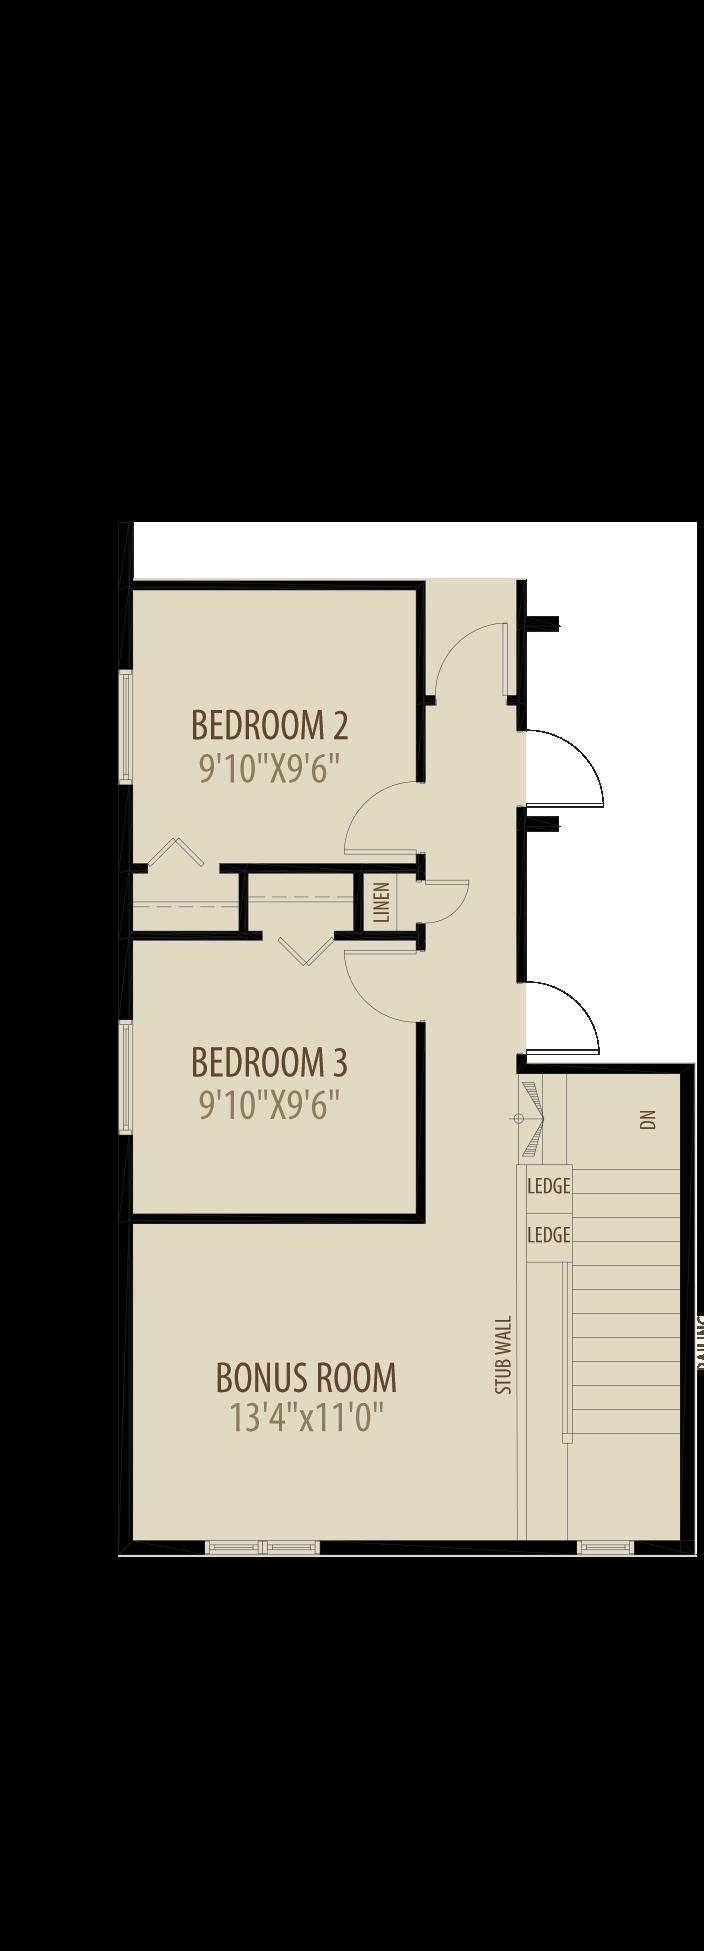 Bonus Room adds 144sq ft